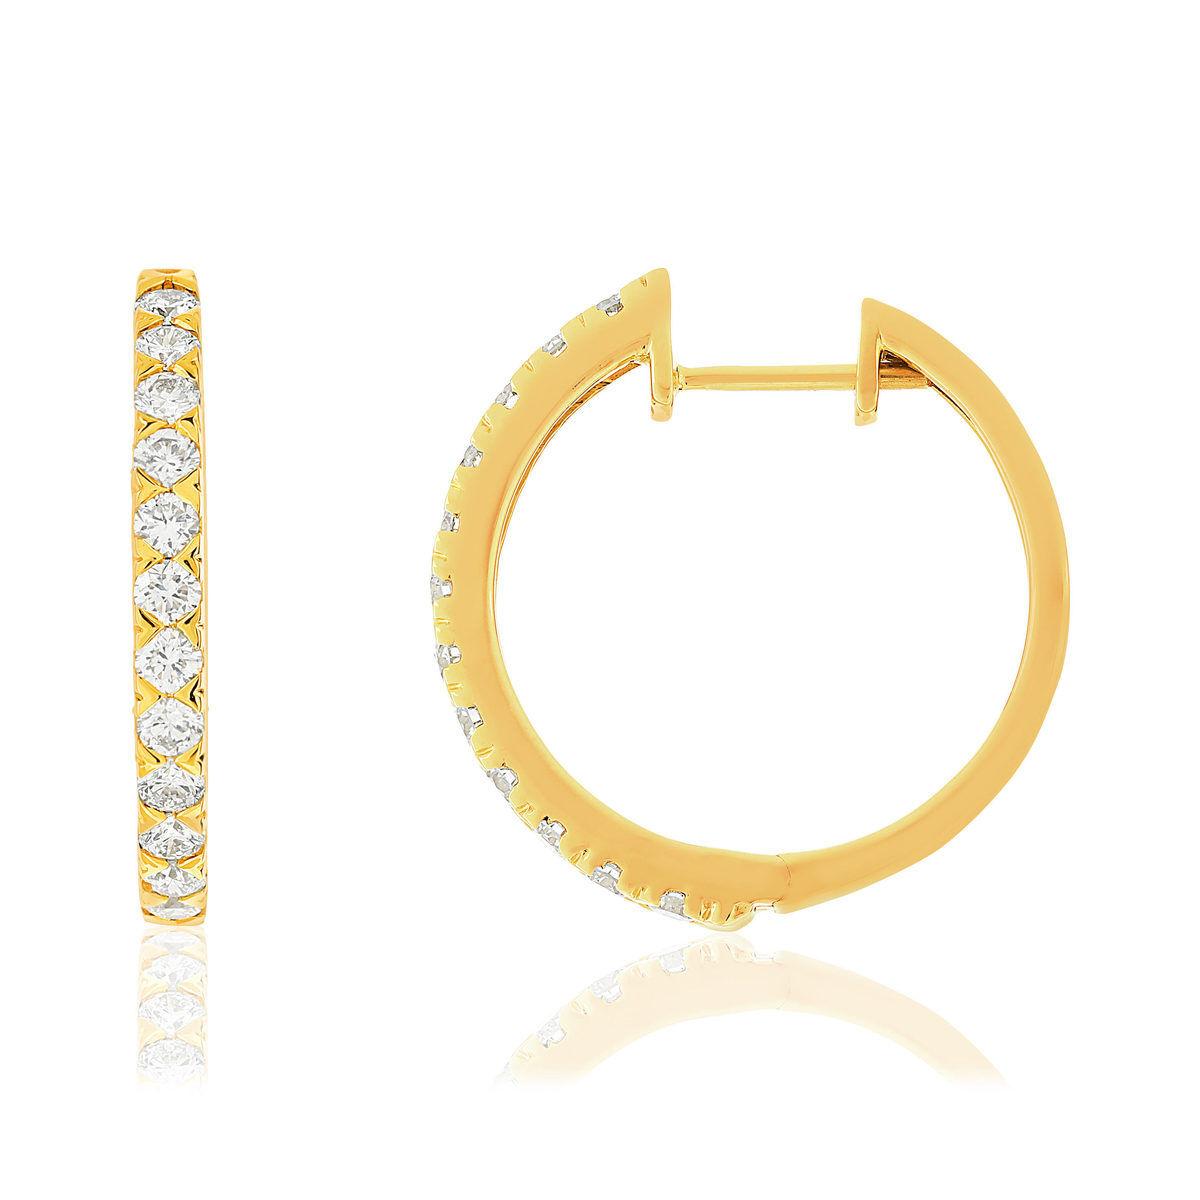 MATY Créoles or 750 jaune diamants synthétiques 1 carat- MATY